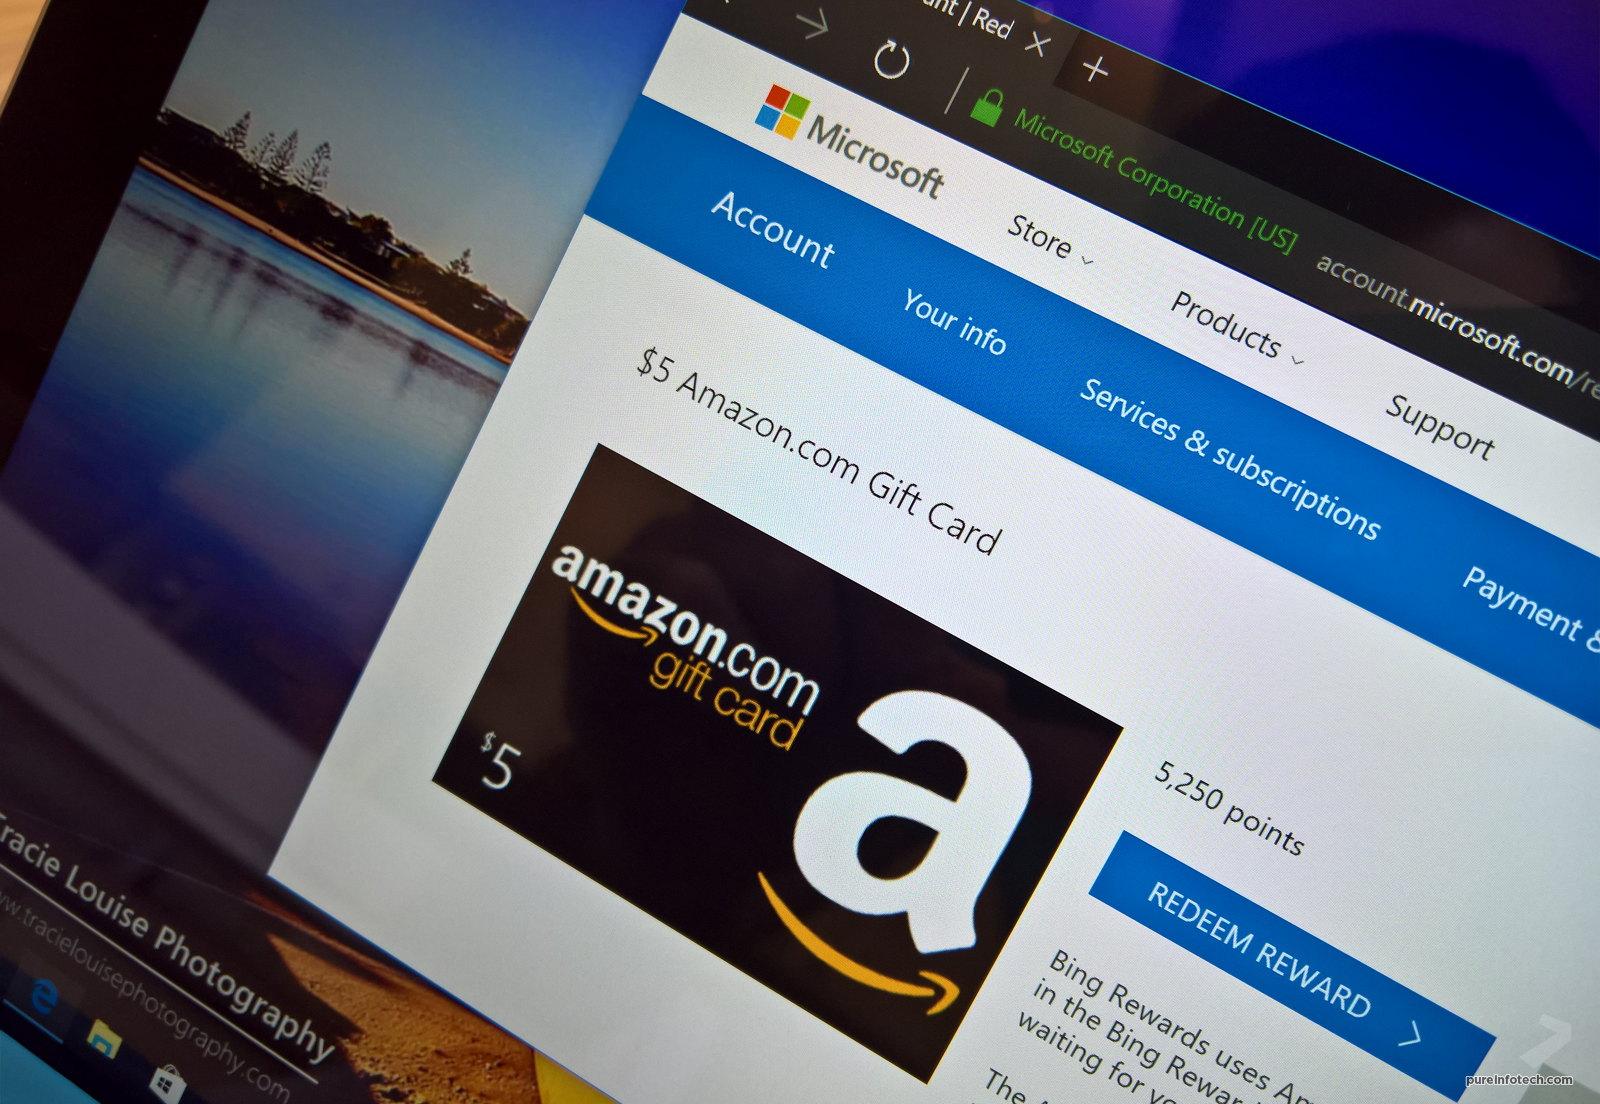 Microsoft Rewards Amazon gift card redeem points